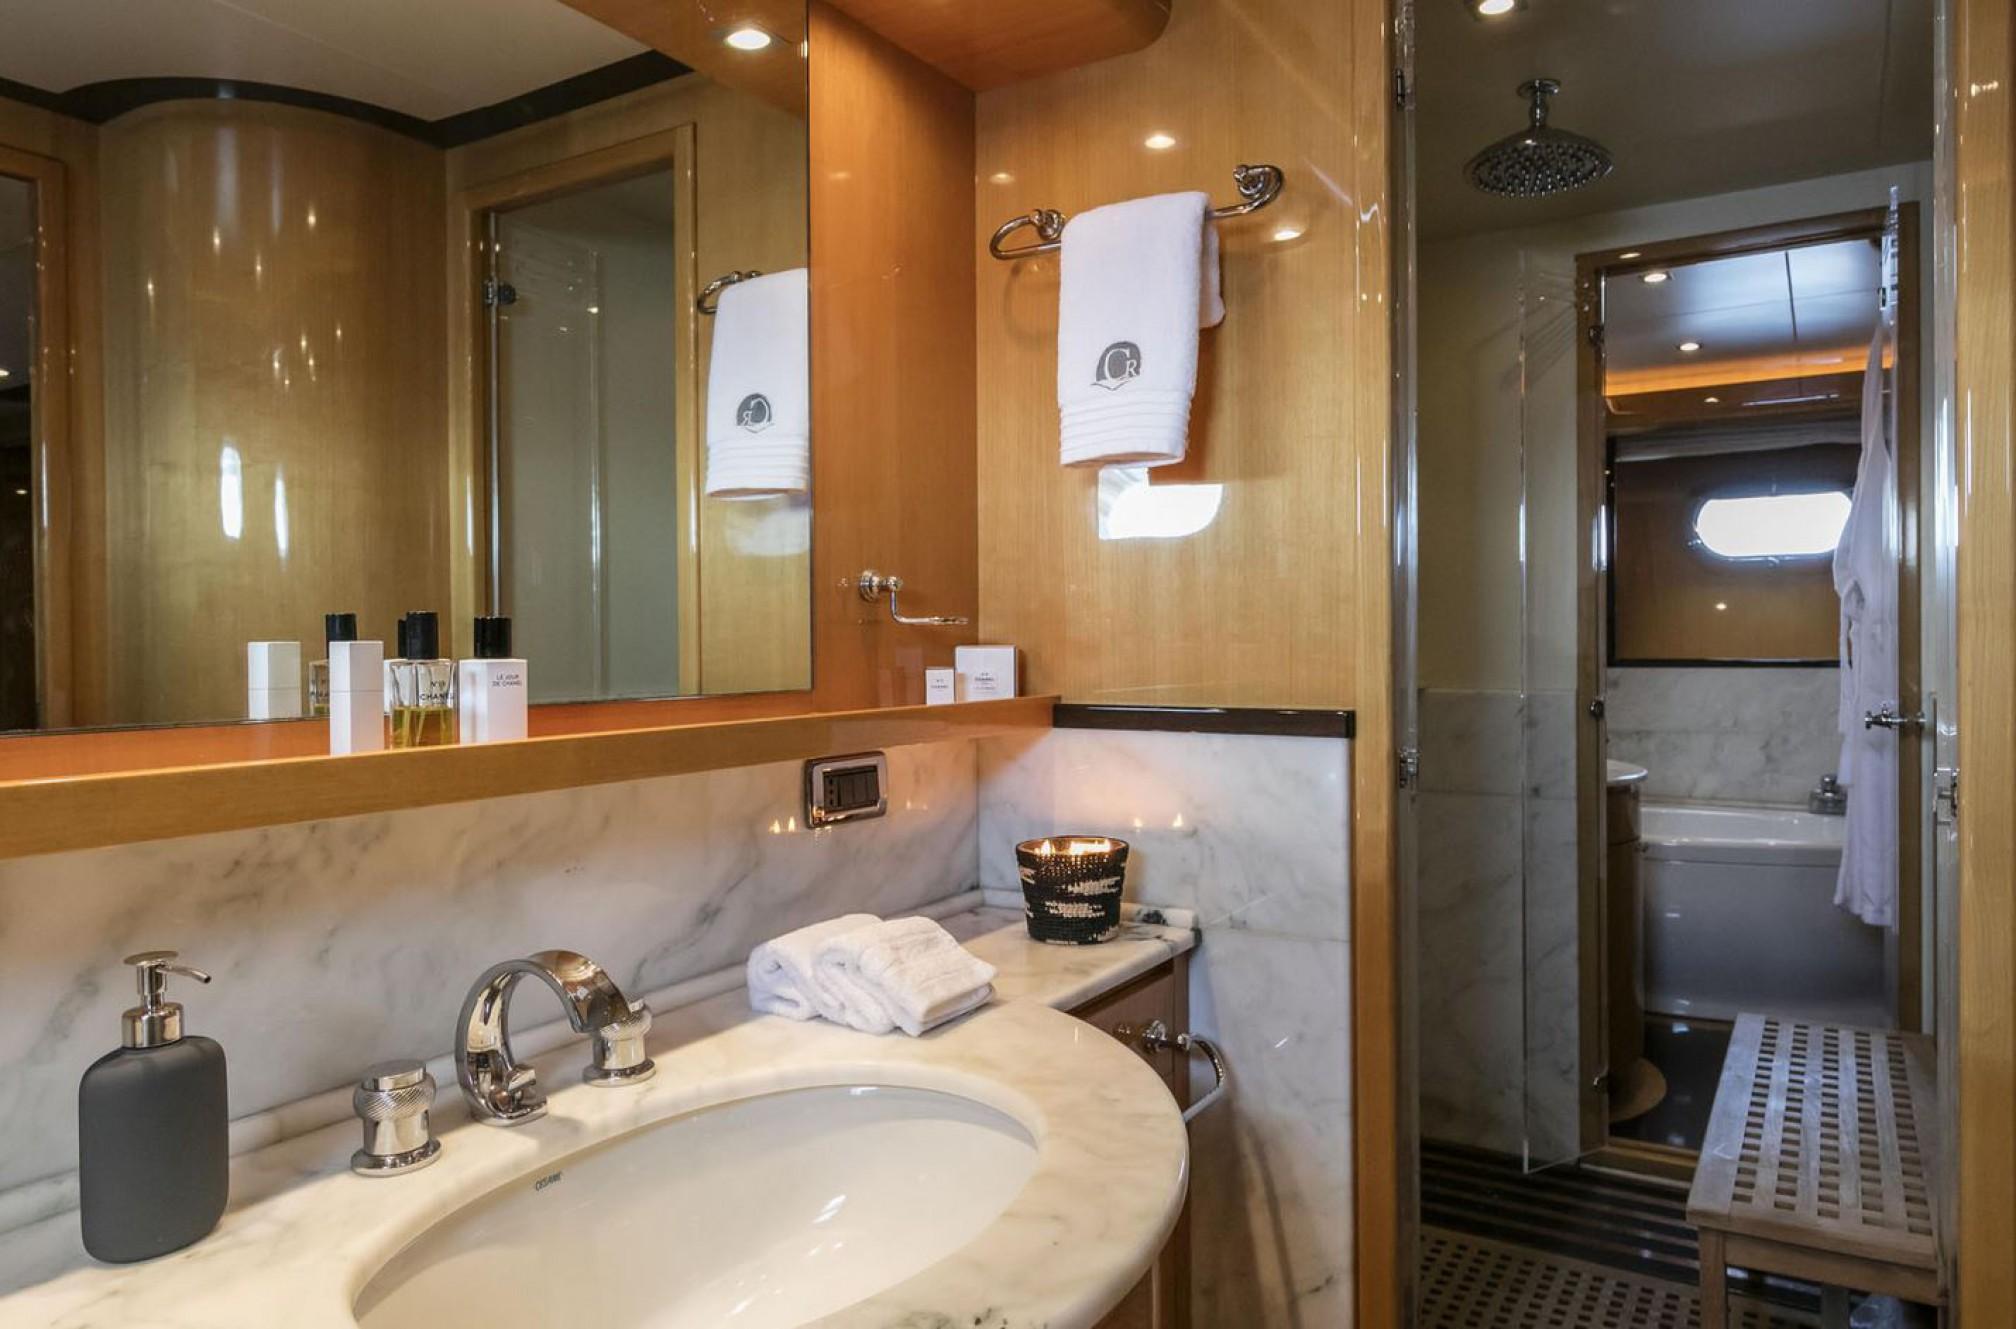 Rental yacht Can't Remember bath